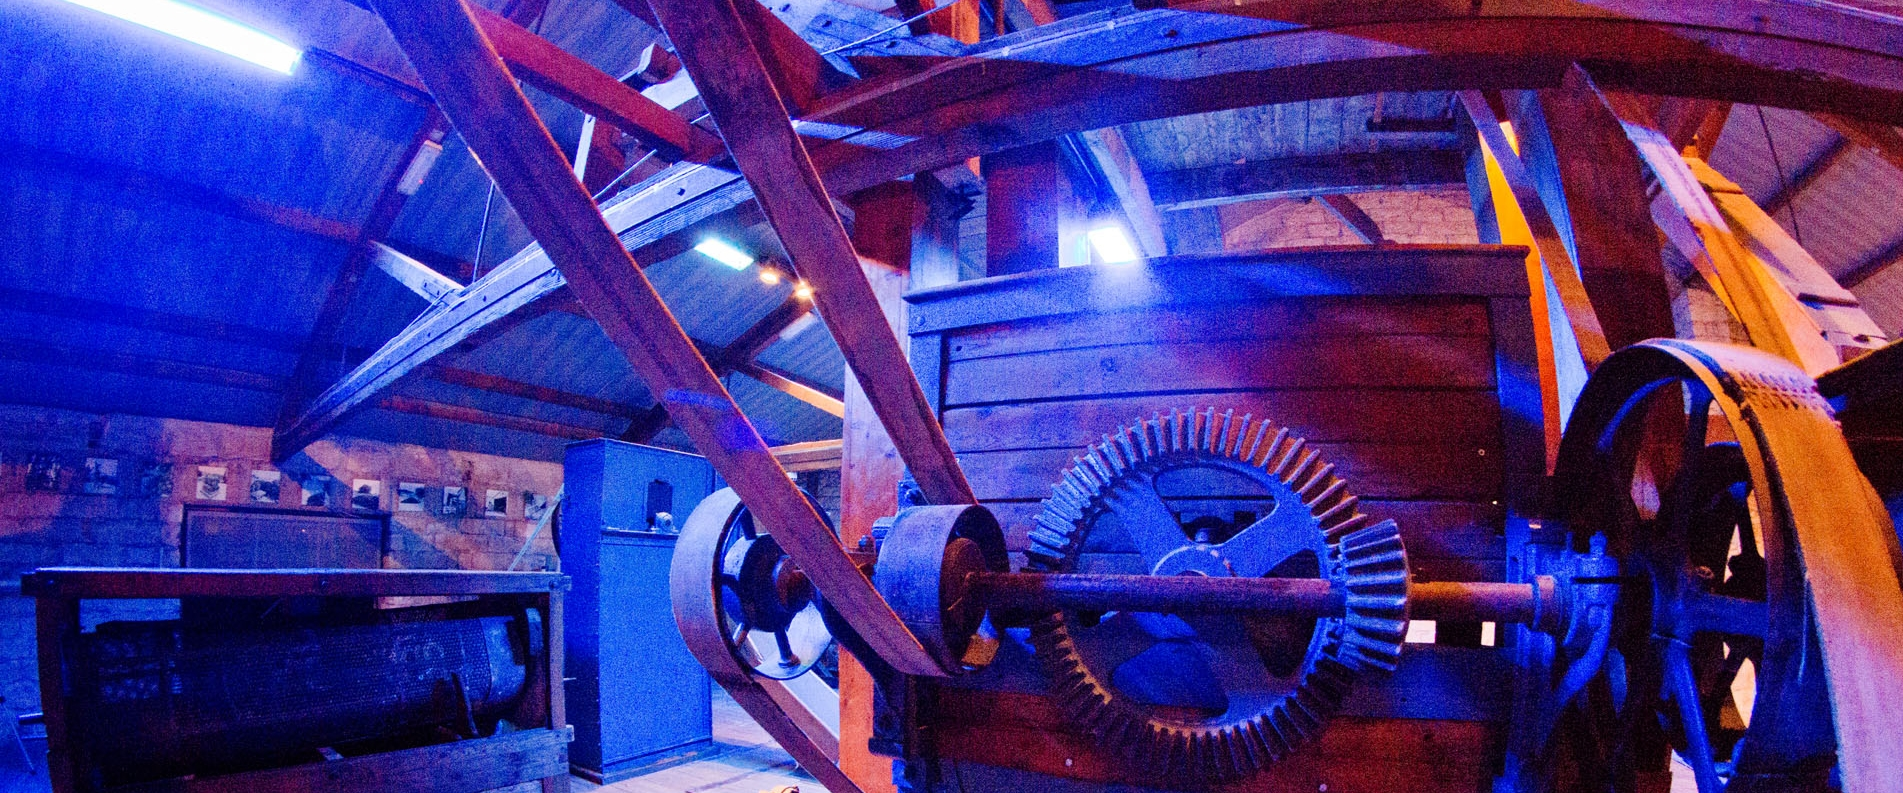 Limassol's Carob Mill Museum